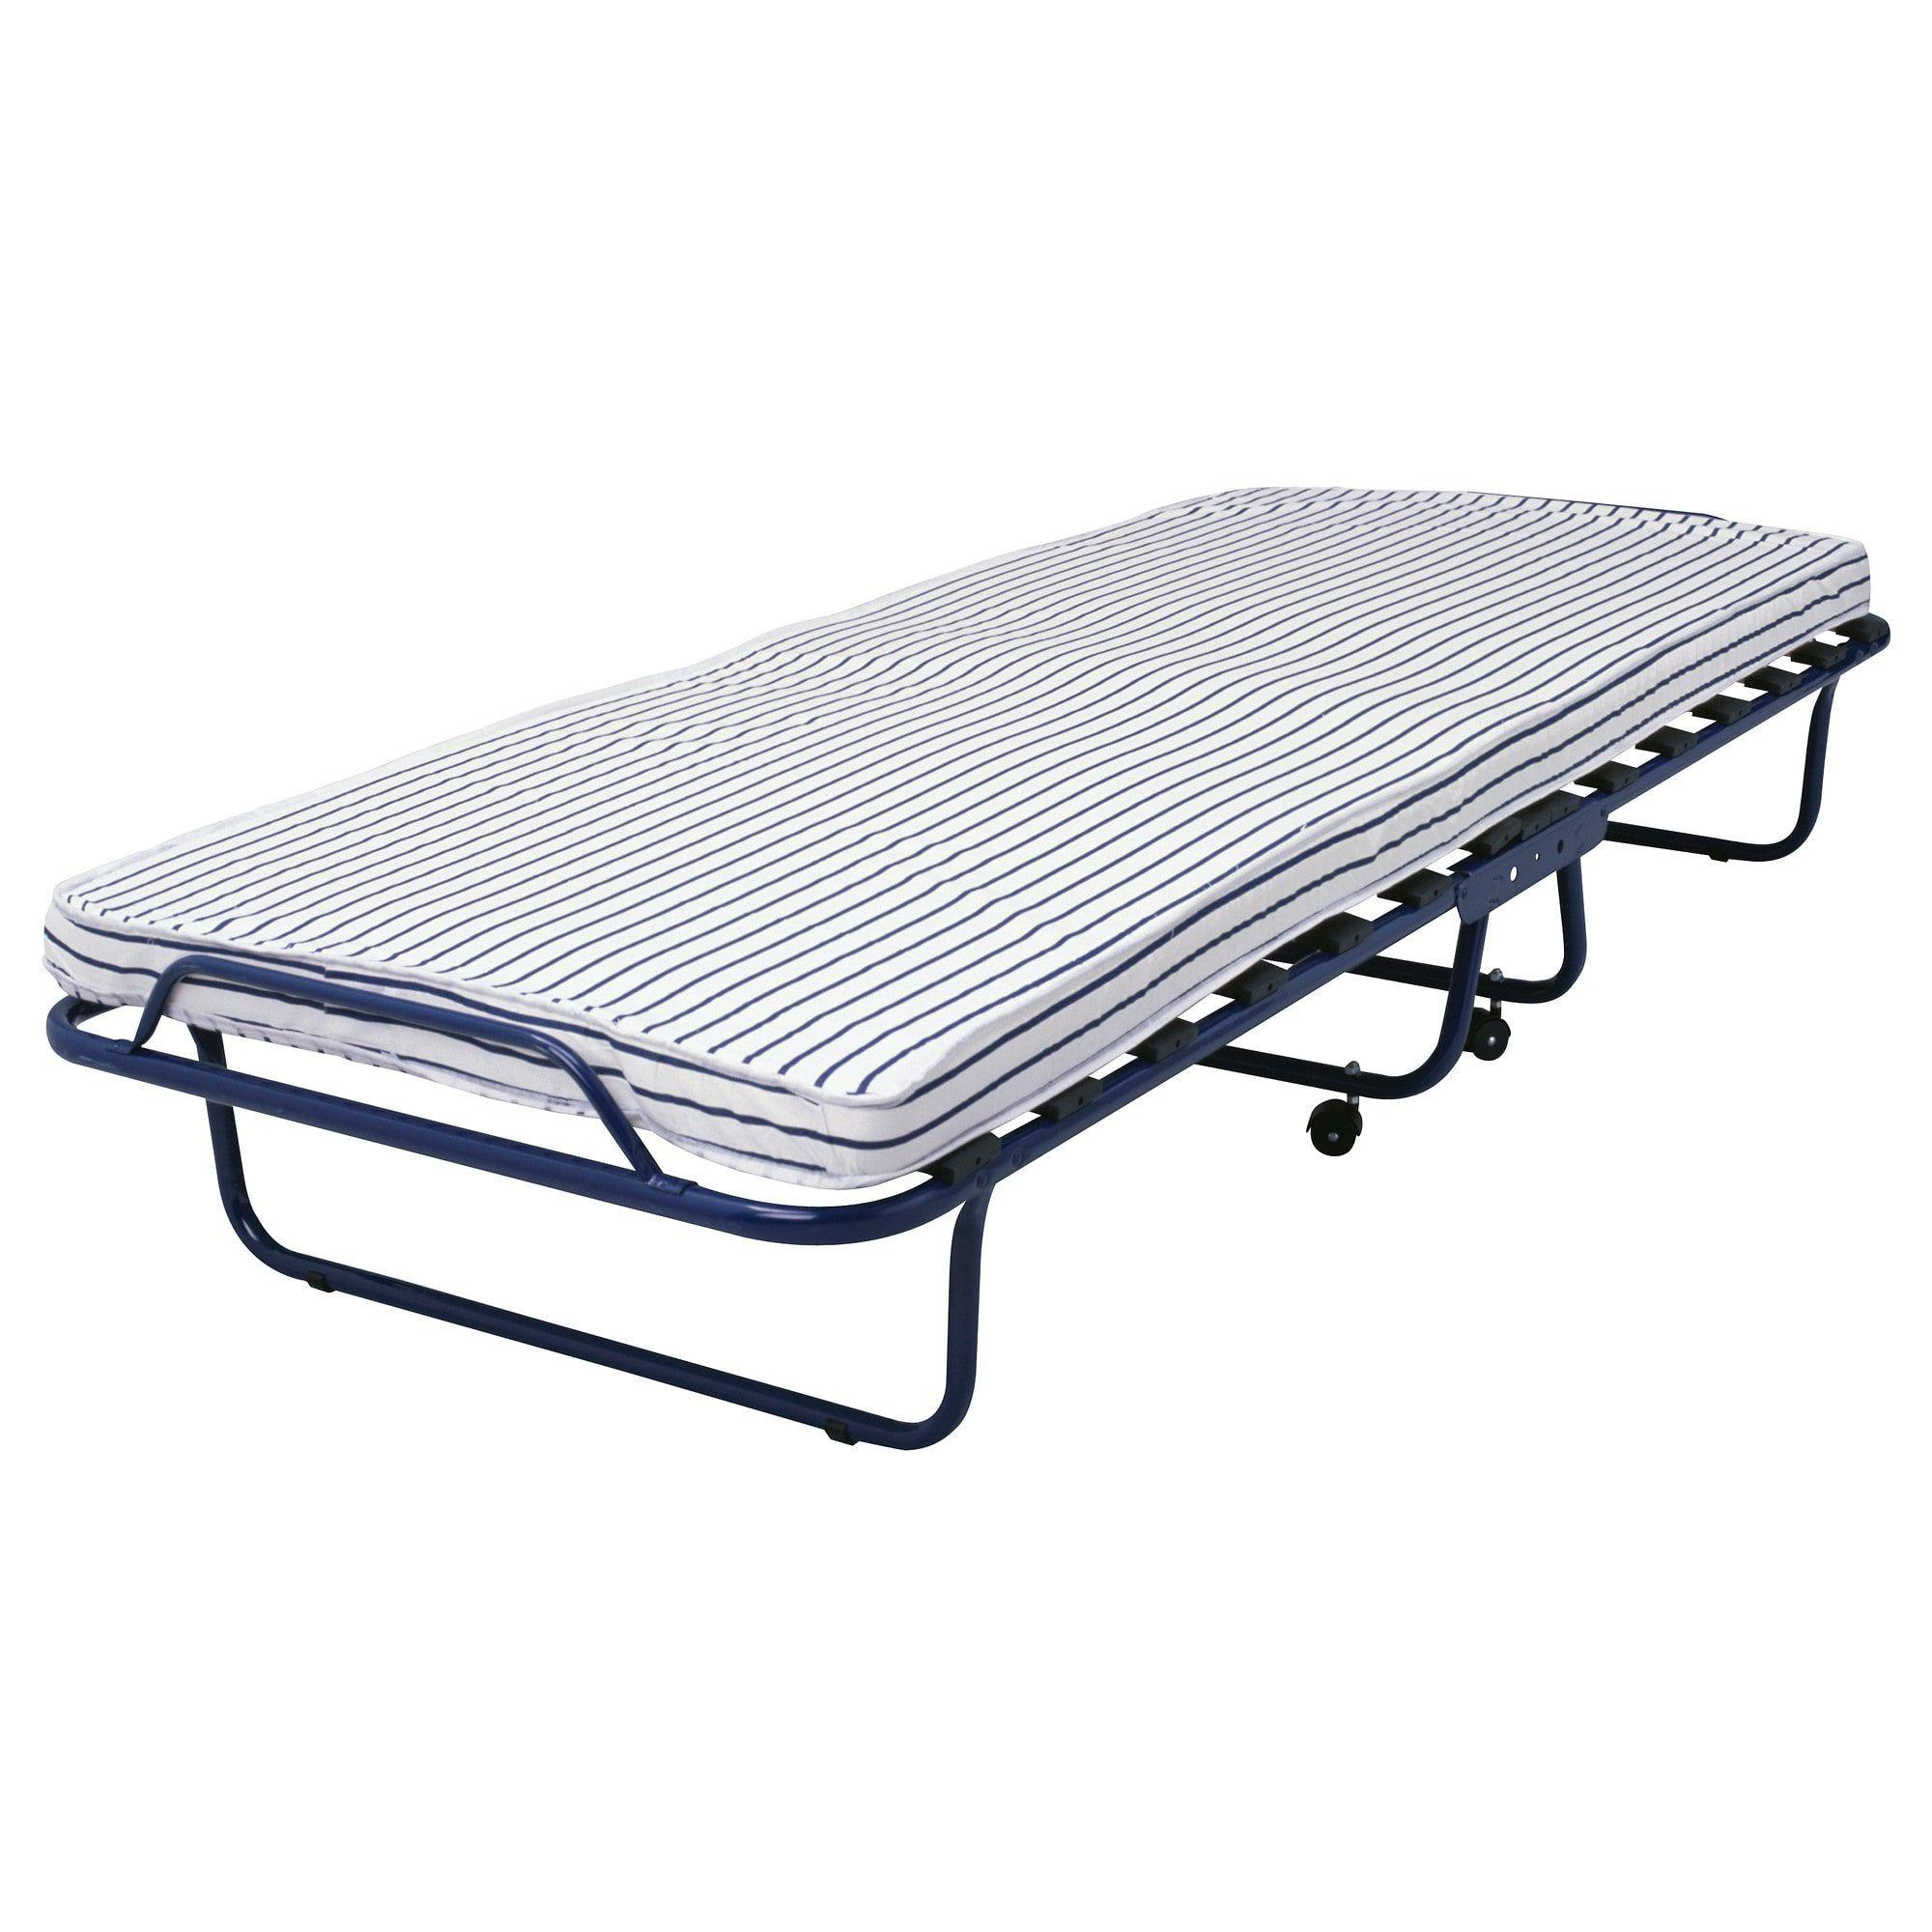 Sandvika Guest Bed Ikea Ikea Guest Bed Folding Bed Ikea Ikea Bed